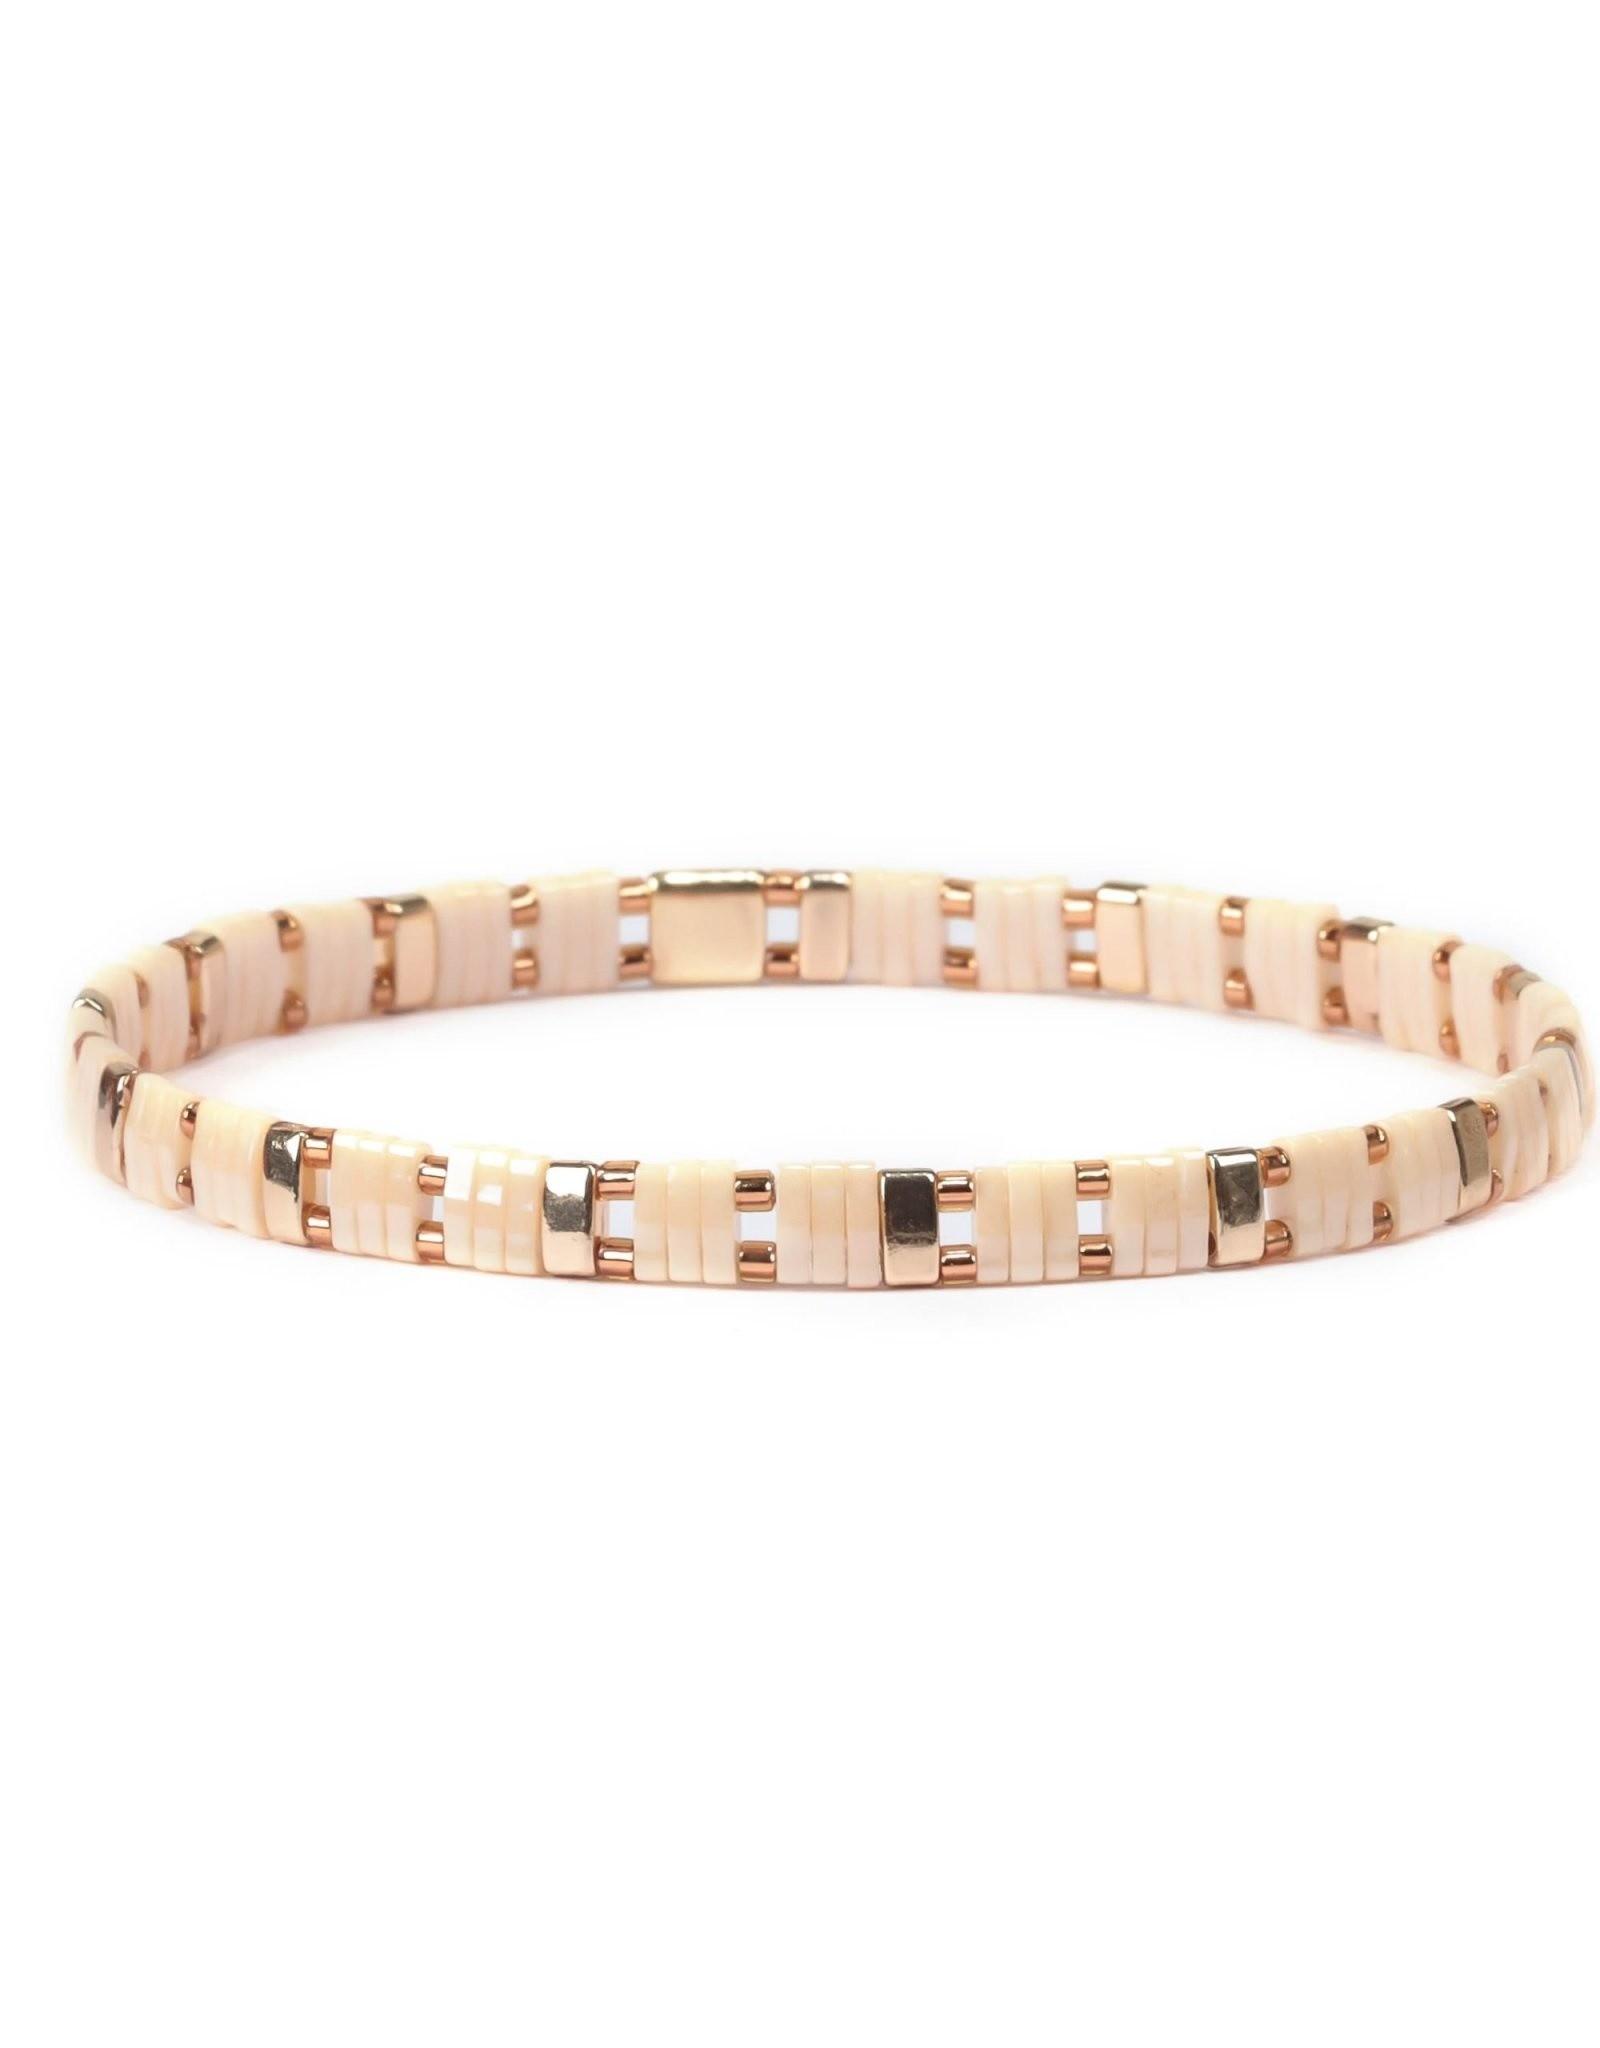 Splendid Iris Daniela Tila Stretch Bracelet